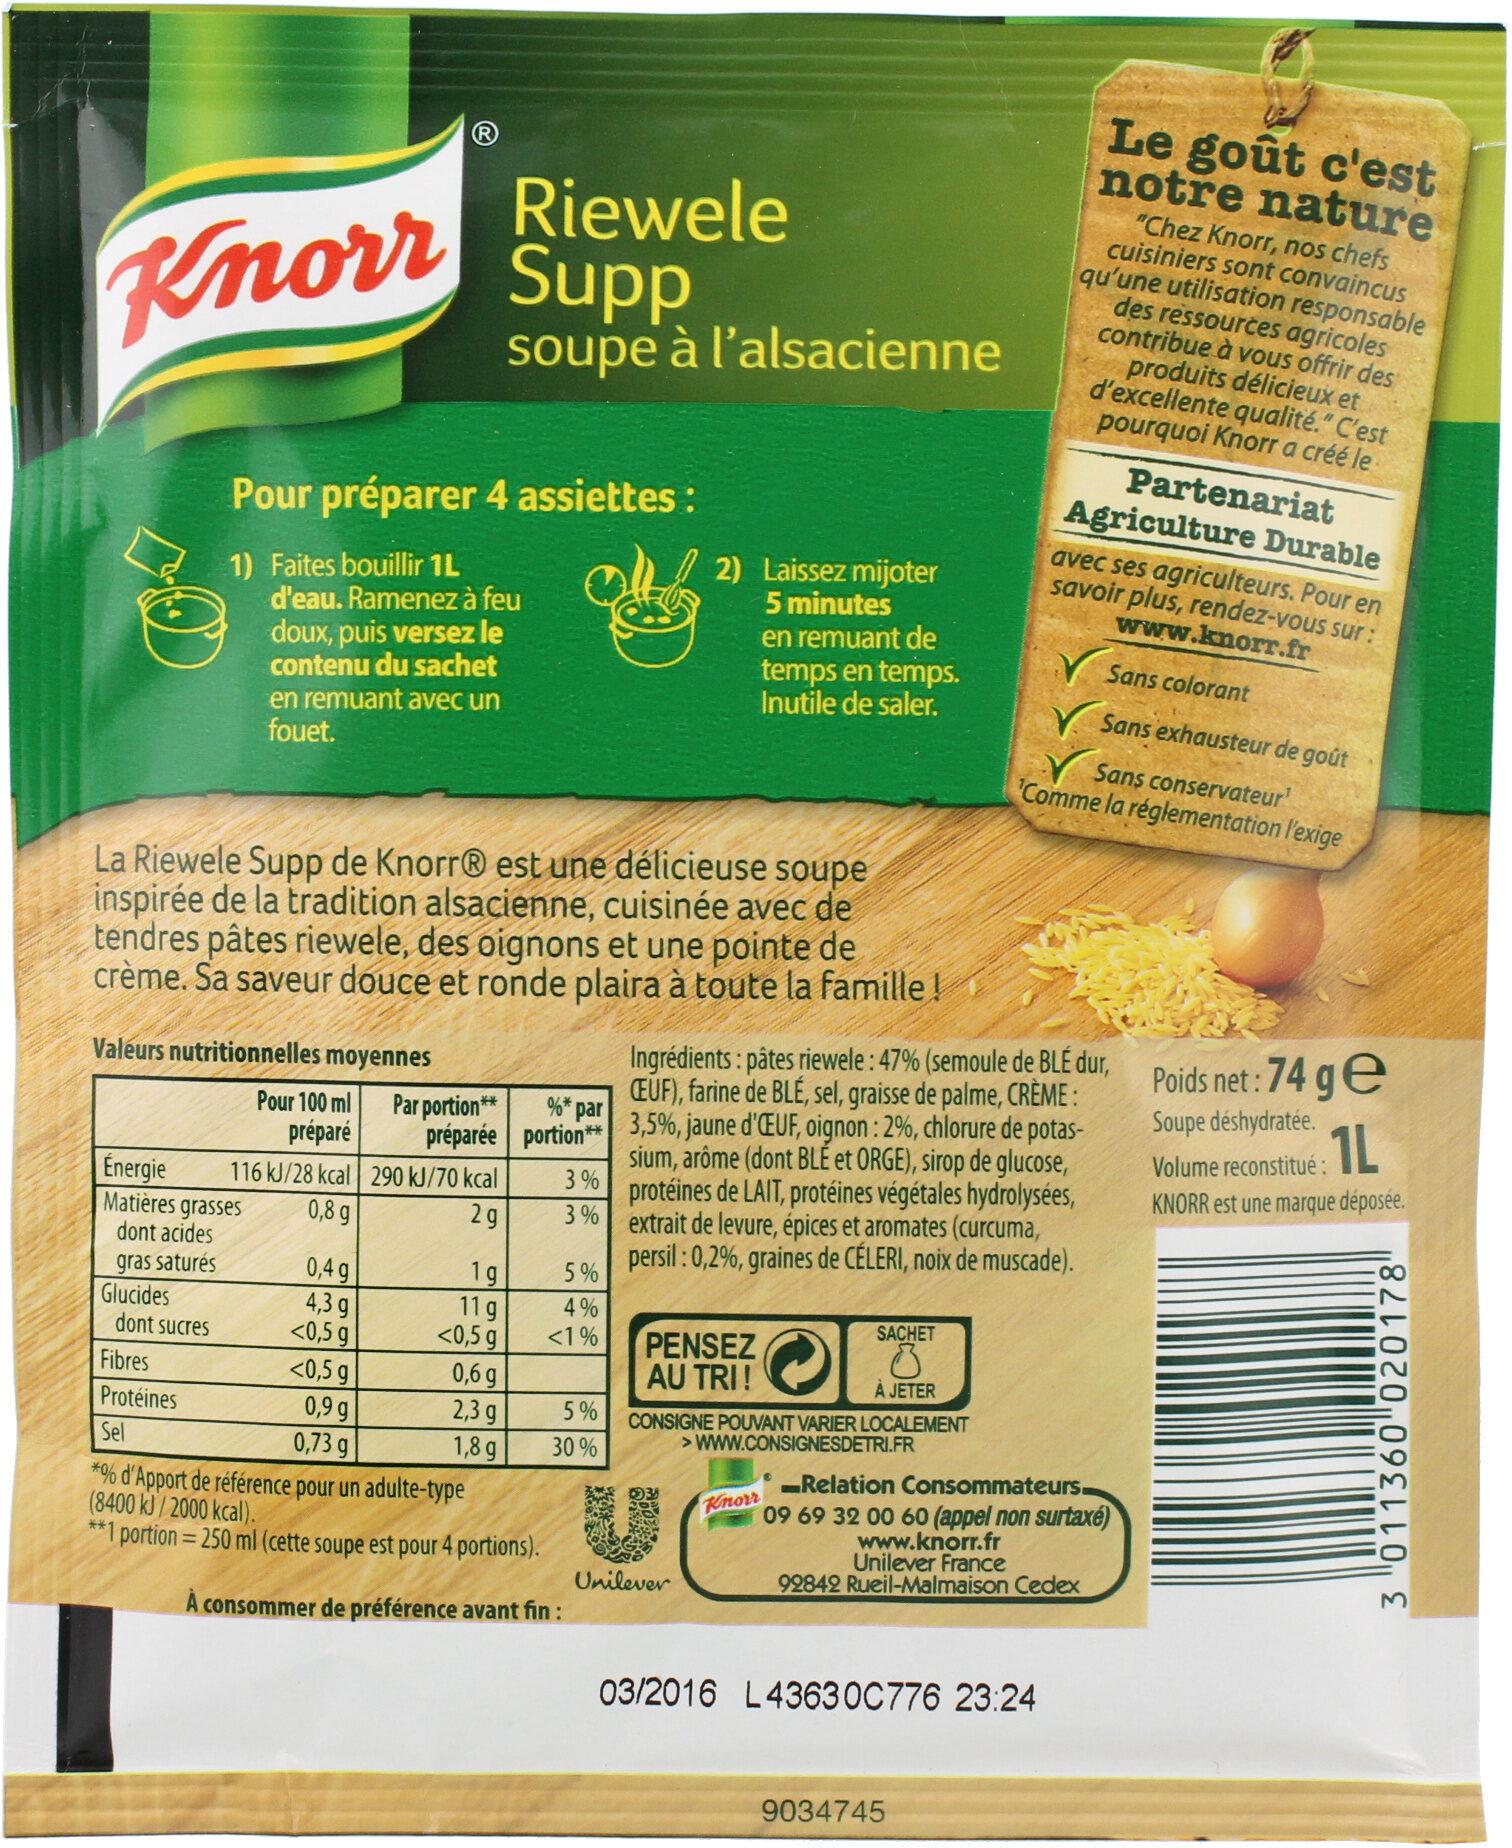 Knorr Soupe À L'Alsacienne Riewele Supp 74g 4 Portions - Ingrediënten - fr